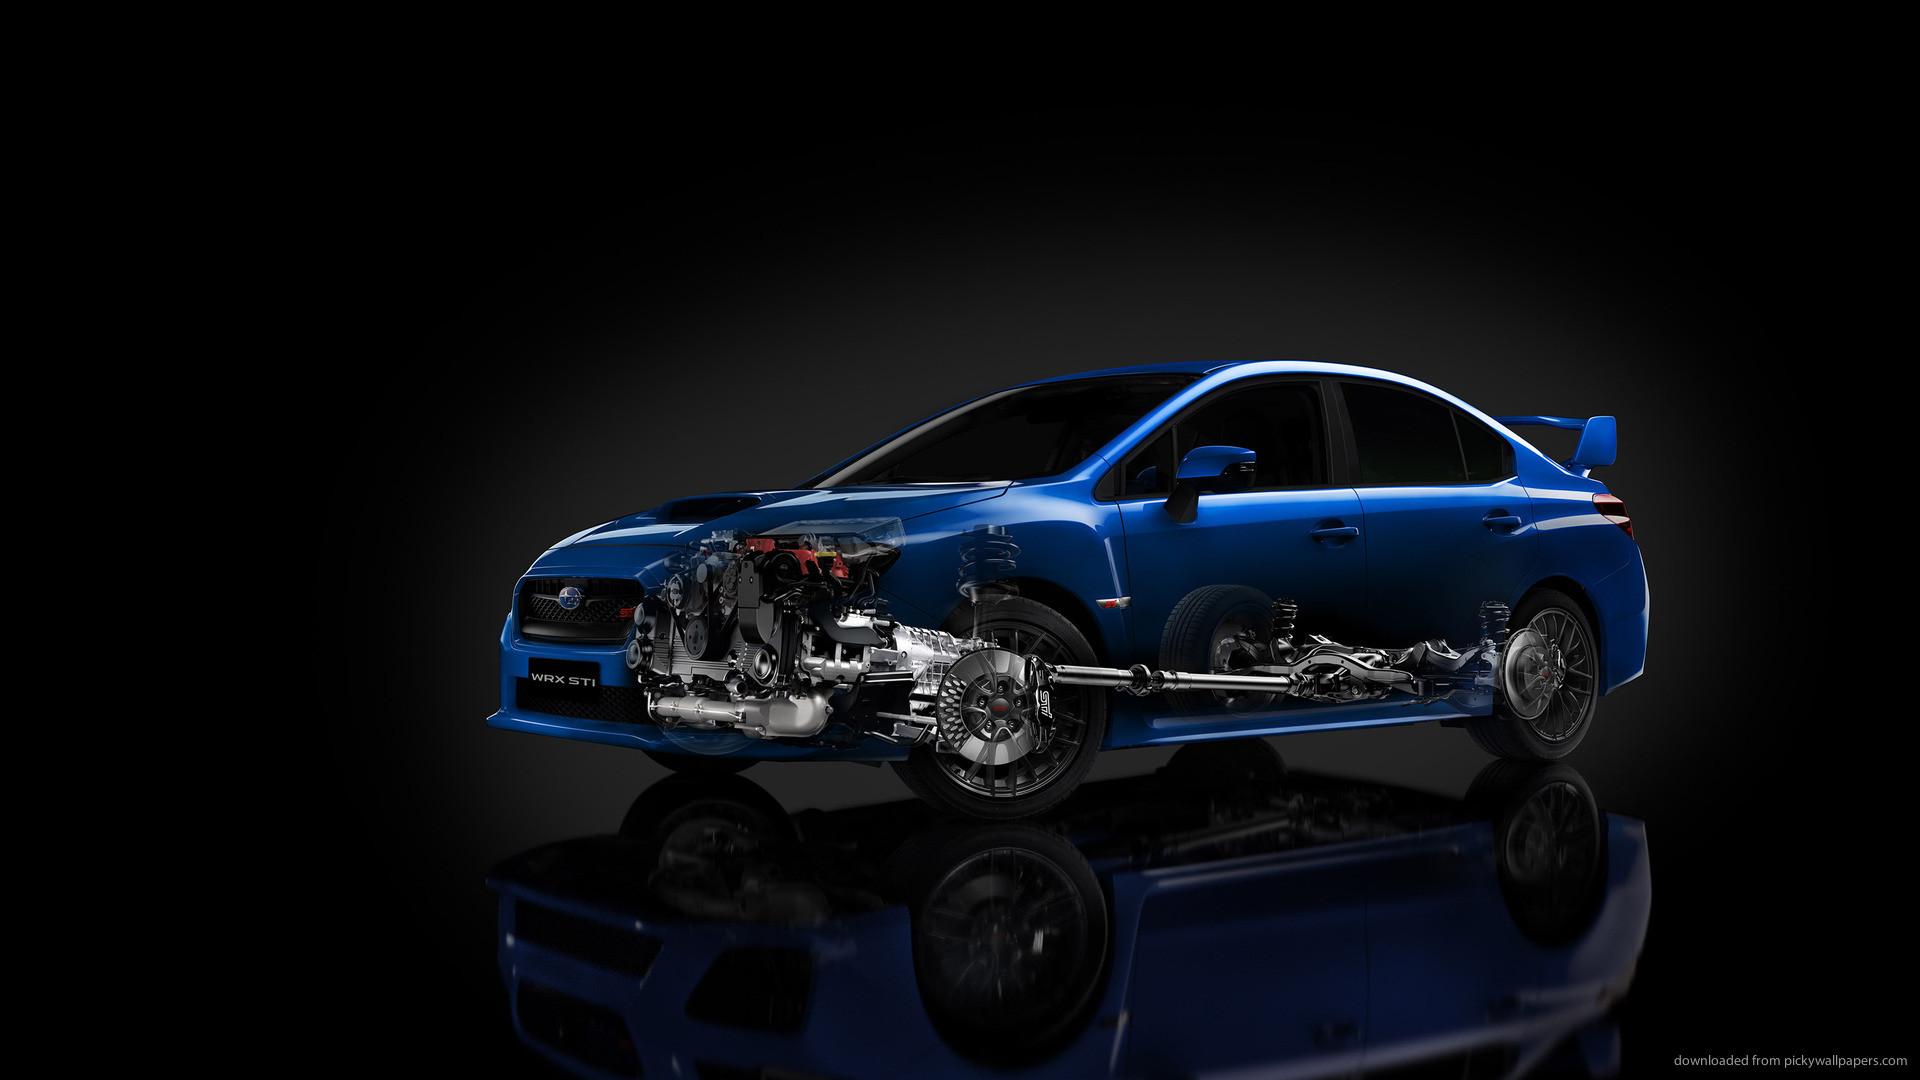 Transparent Subaru WRX STI Launch Edition picture